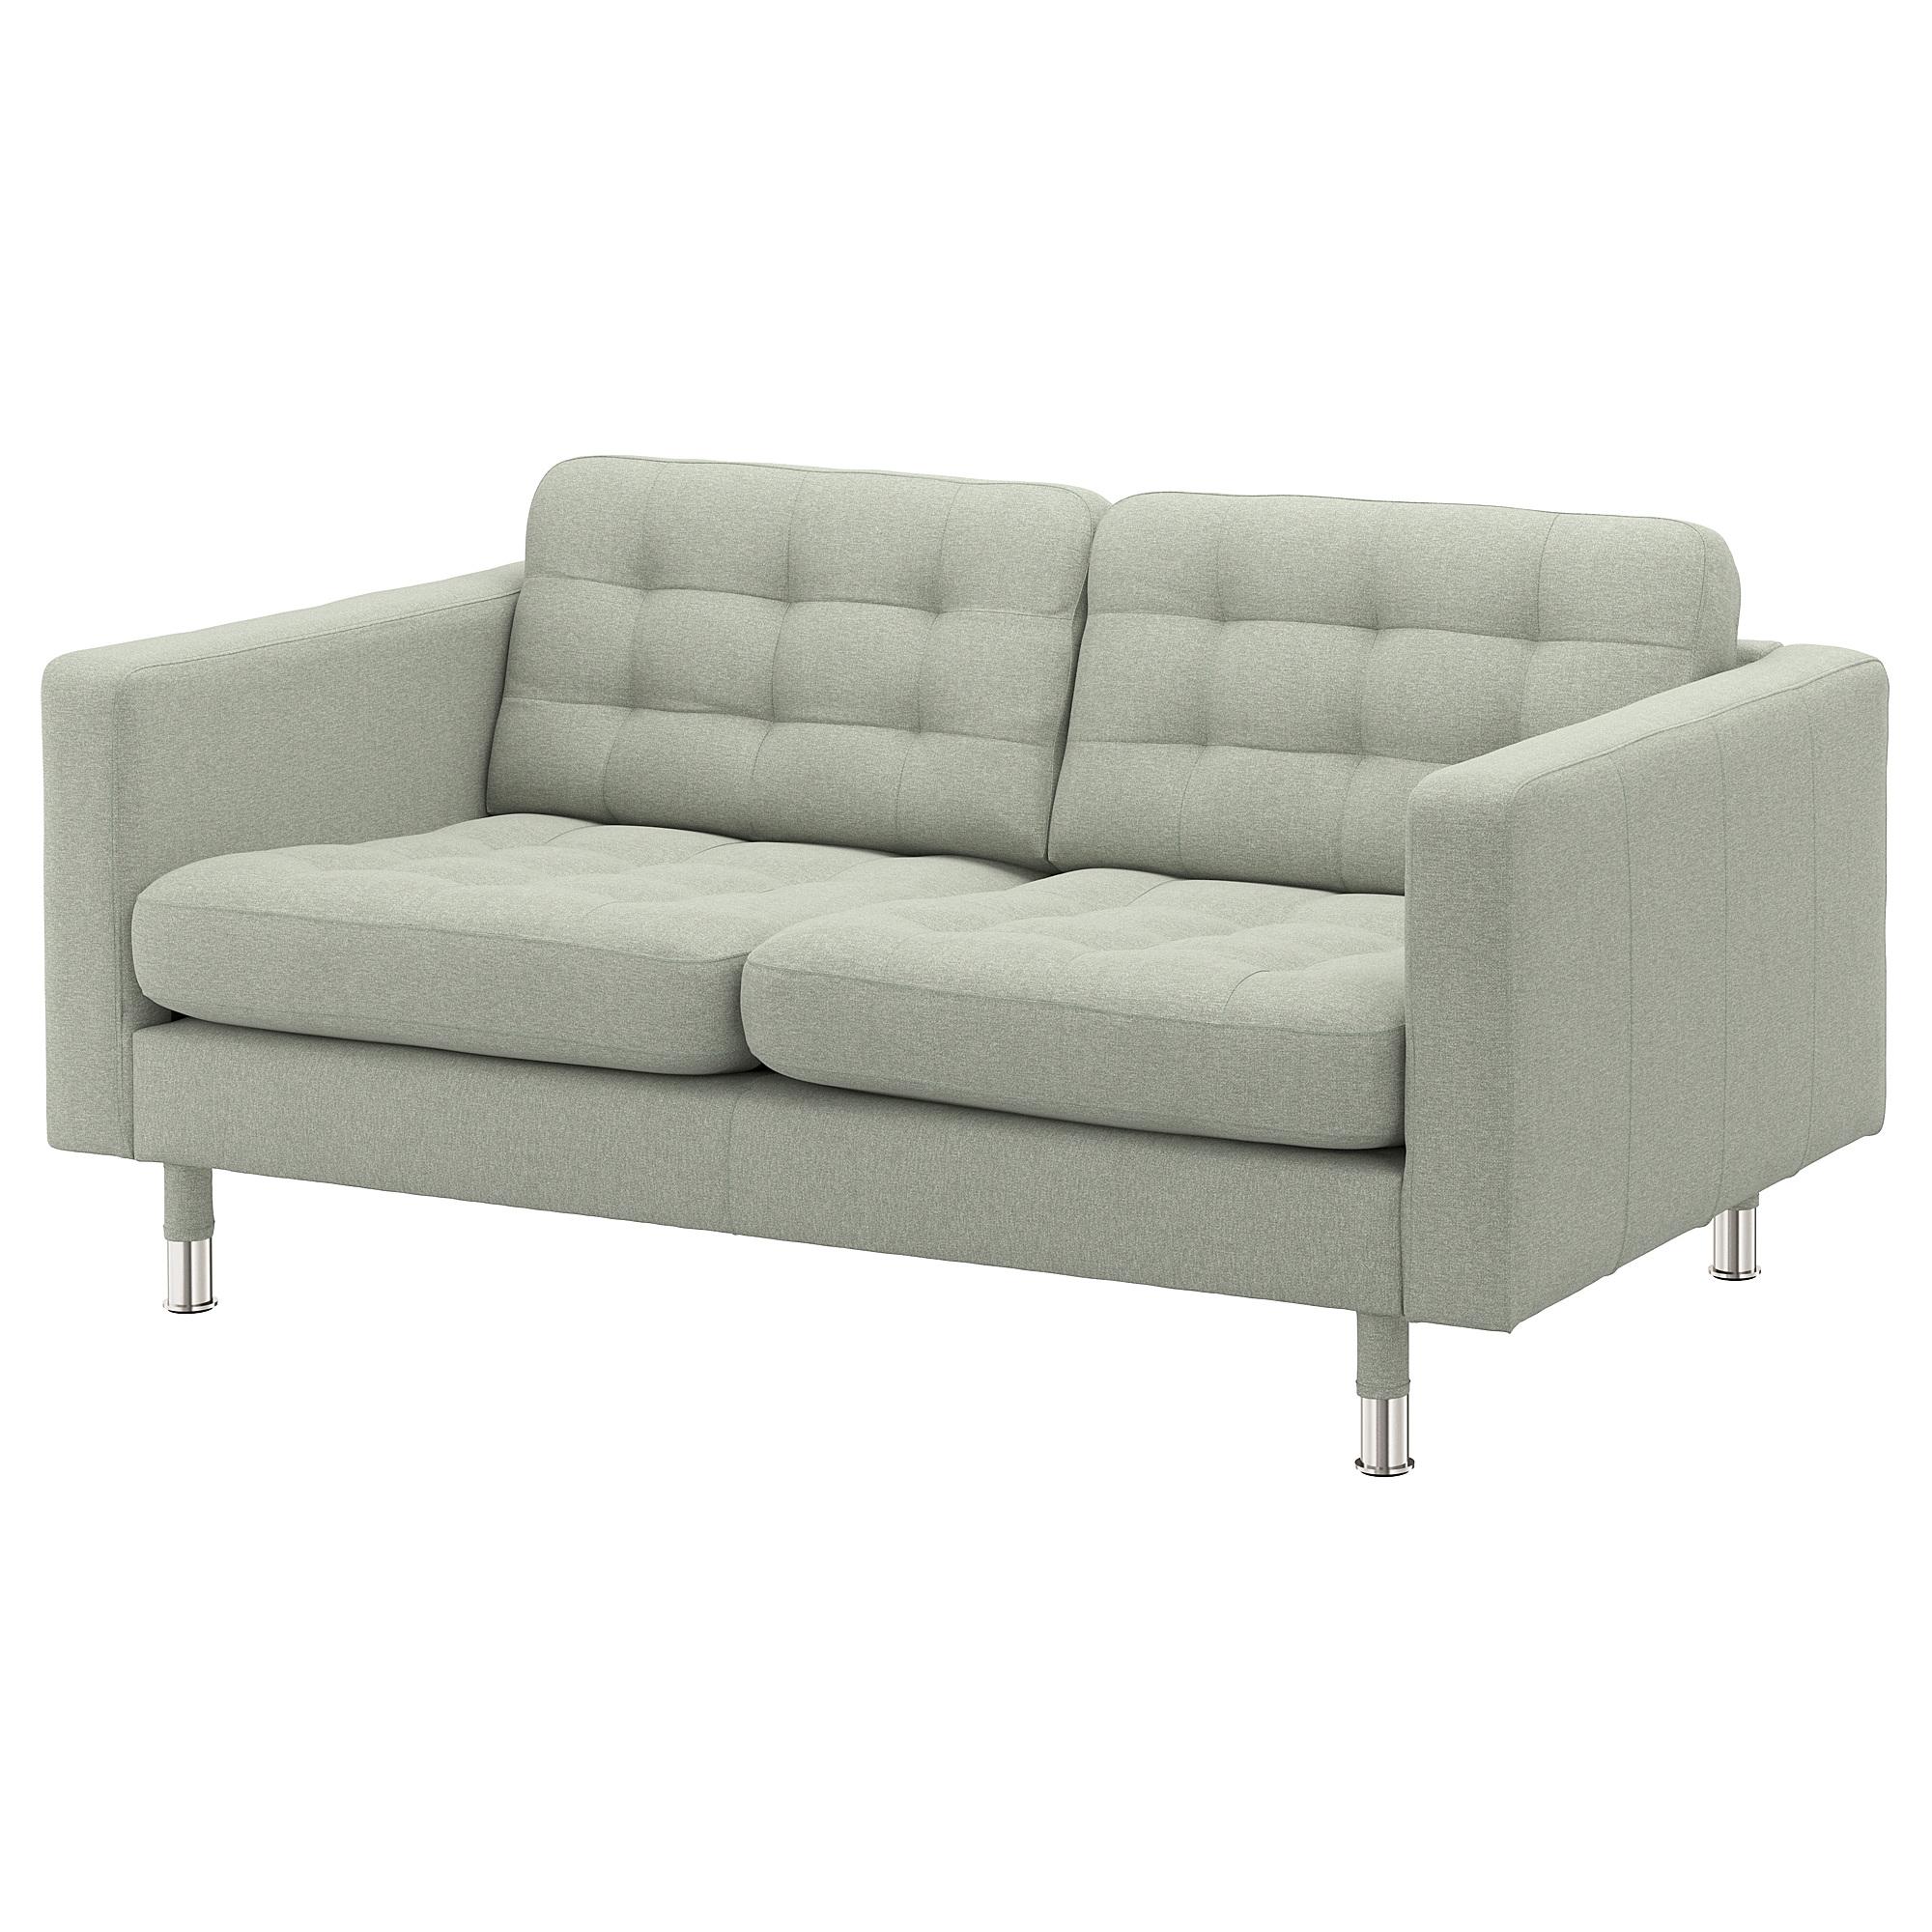 3e1eaf953bd LANDSKRONA sofá de 2 plazas